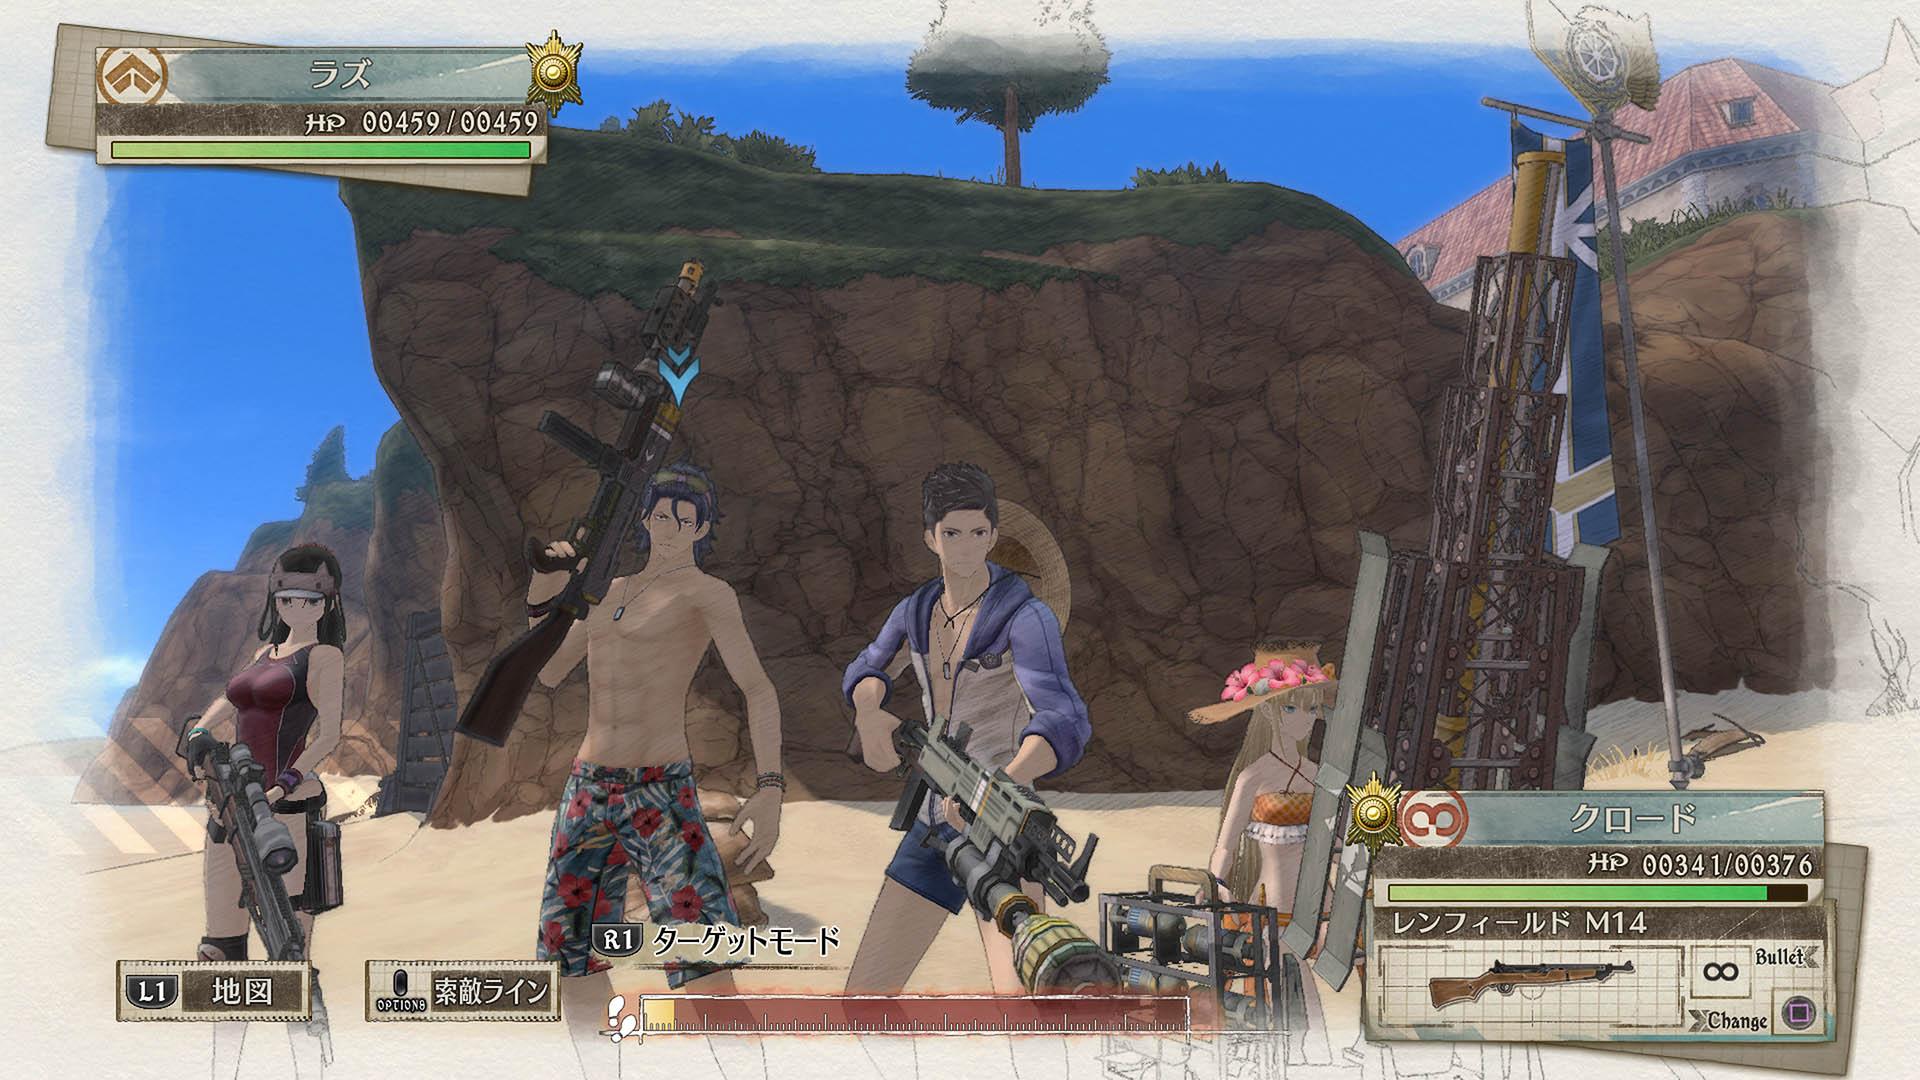 [Valkyria Chronicles 4/Senjou no Valkyria 4] รายละเอียด DLC ที่จะตามมาหลังจากนี้!!!